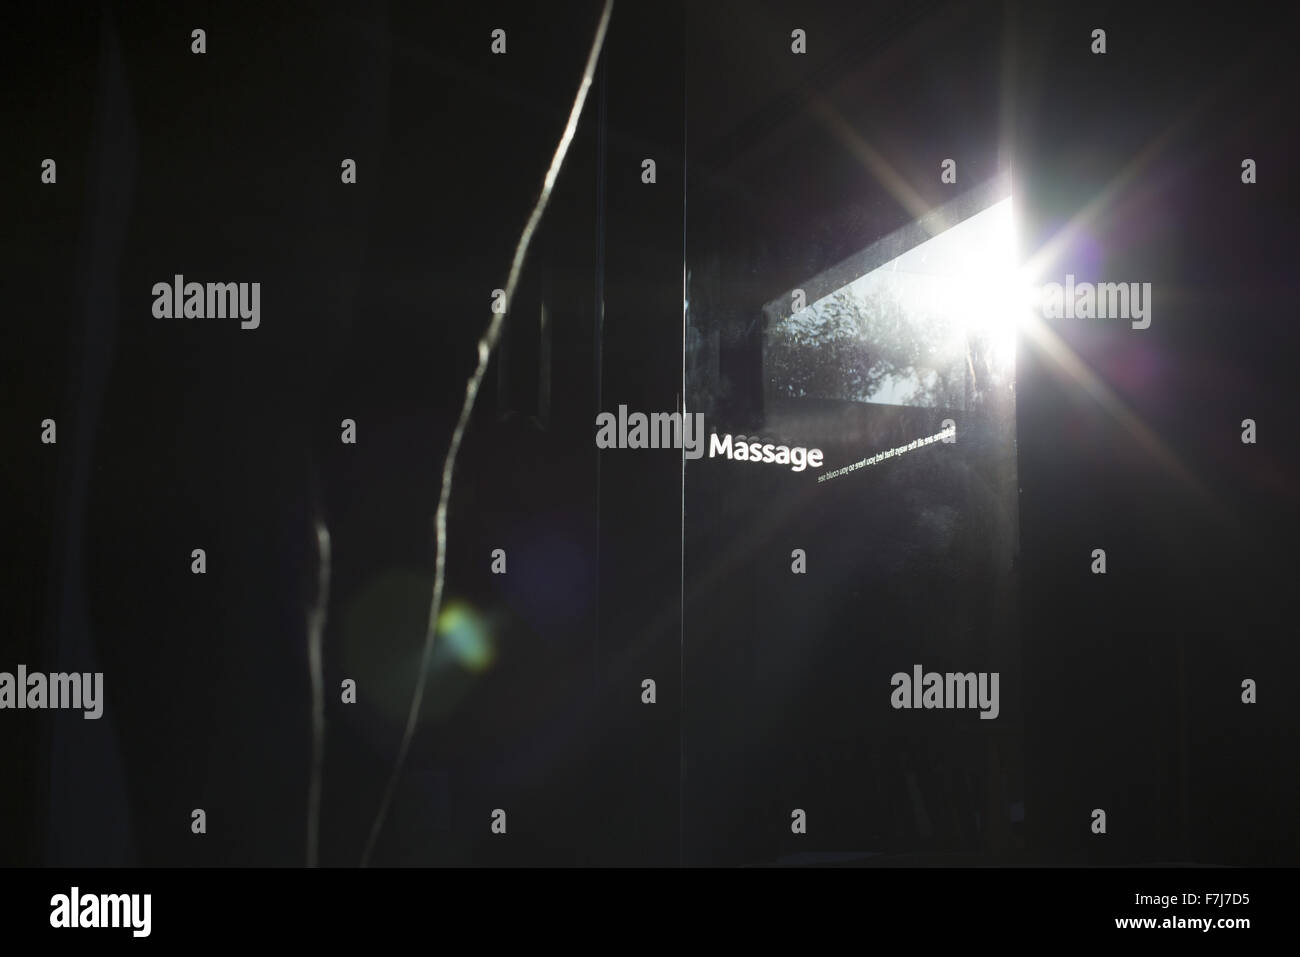 Sunlight shining through glass door in health spa - Stock Image